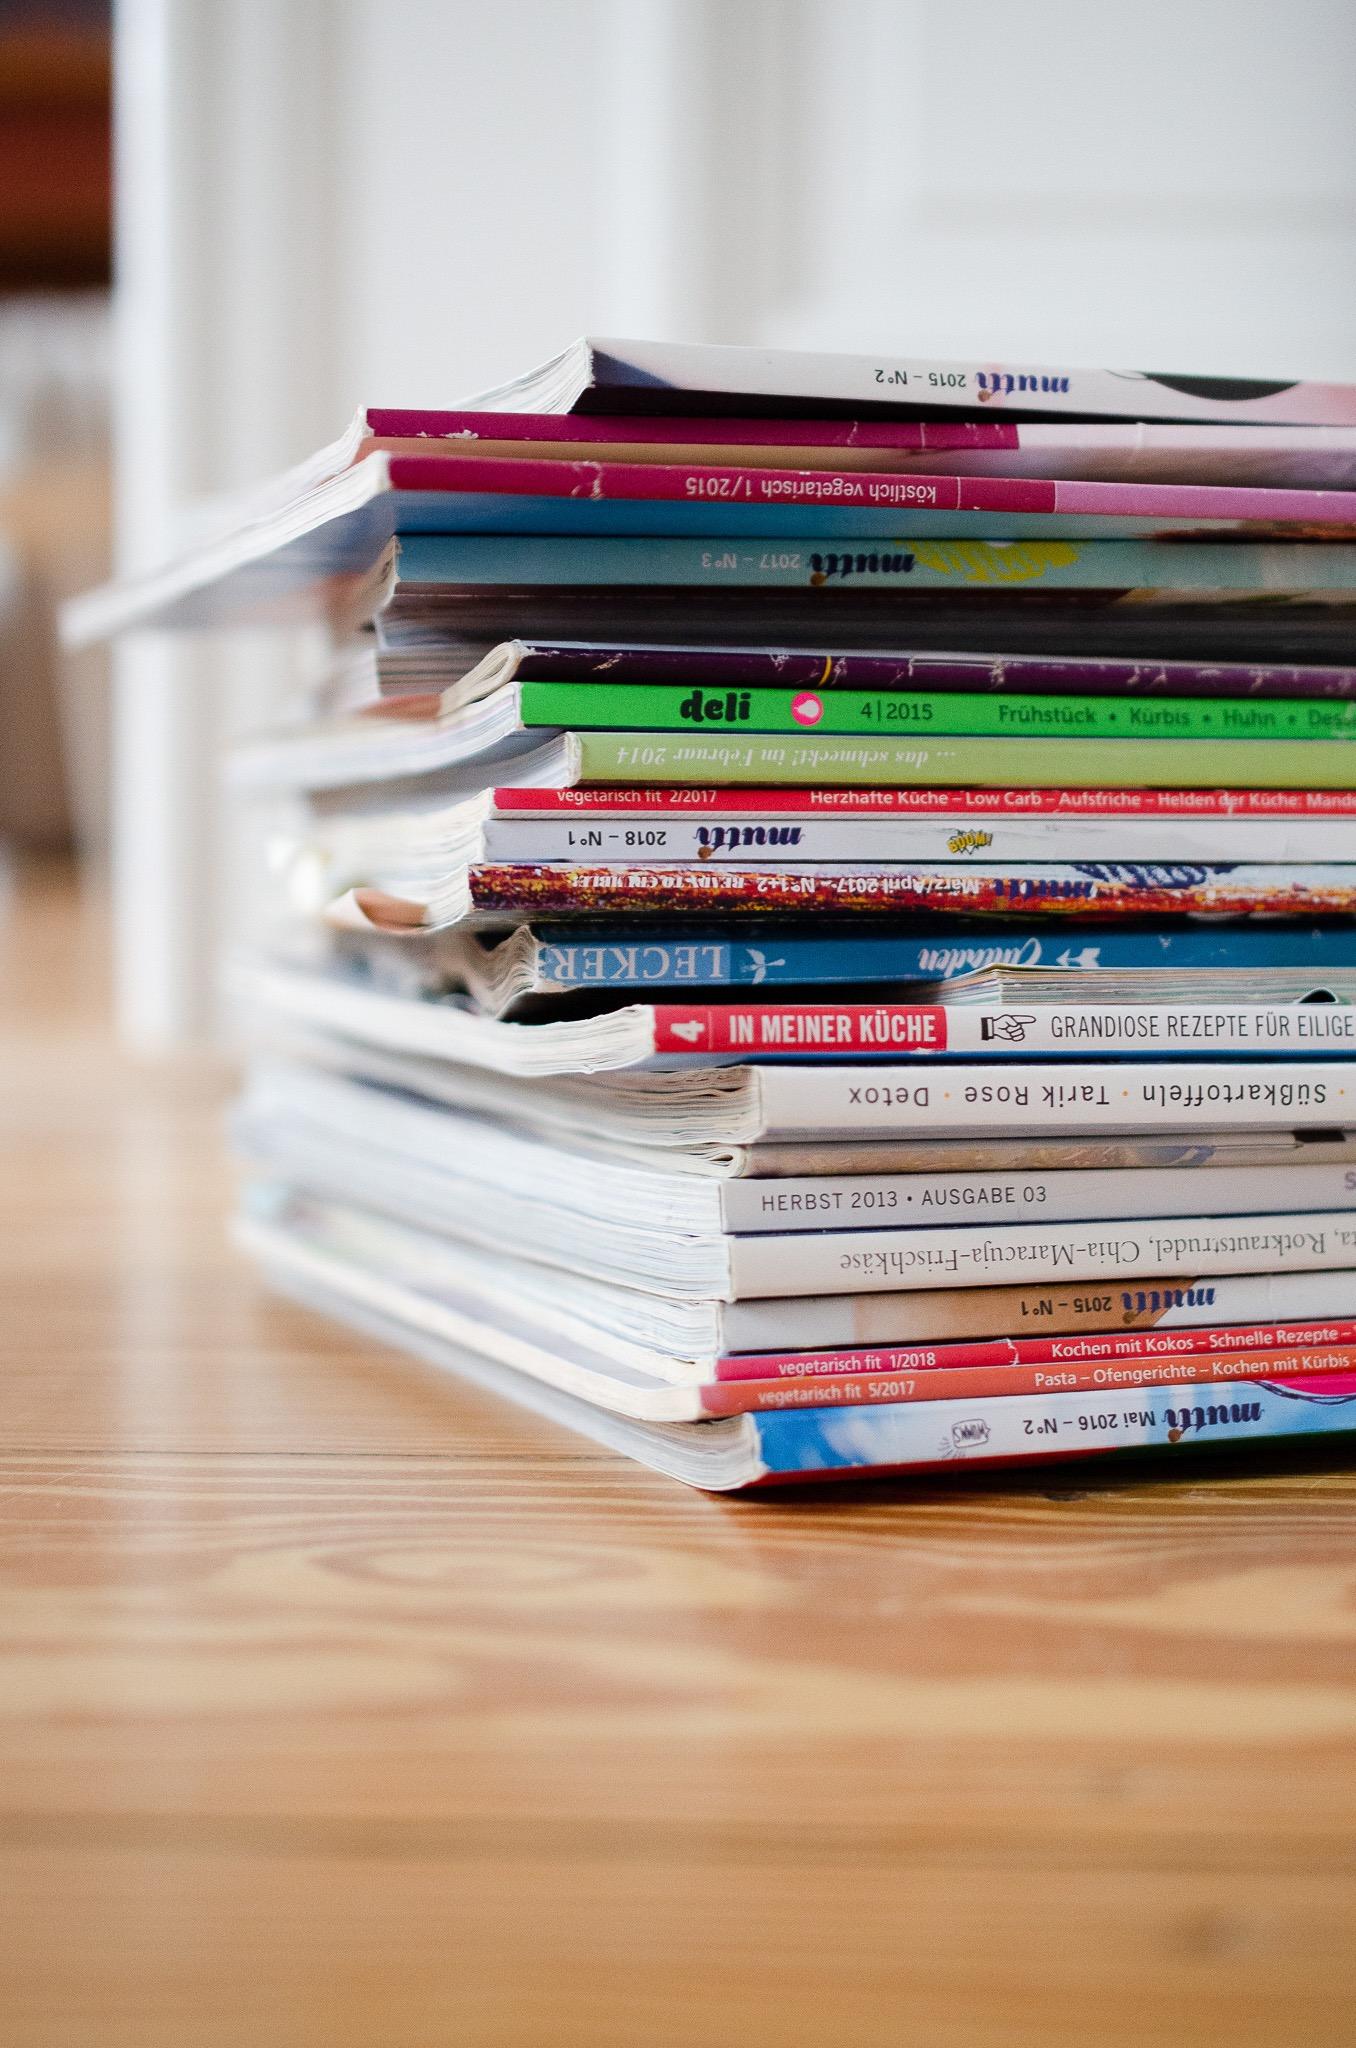 Chaos-Update: Mein Zeitschriften-Dilemma. Oder: Wohin bloß mit den ganzen Magazinen?